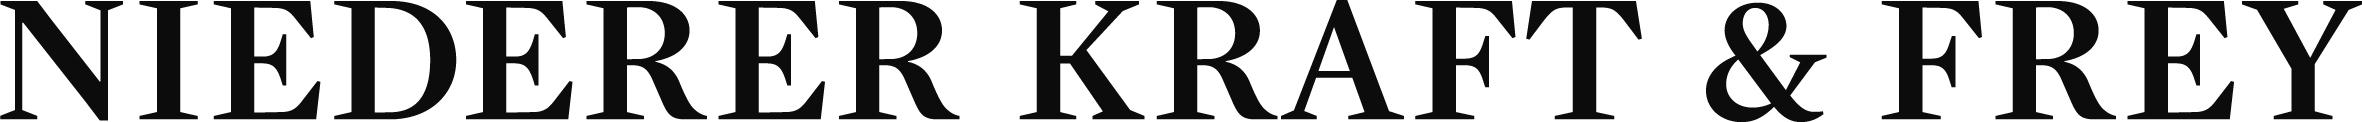 Niederer Kraft & Frey